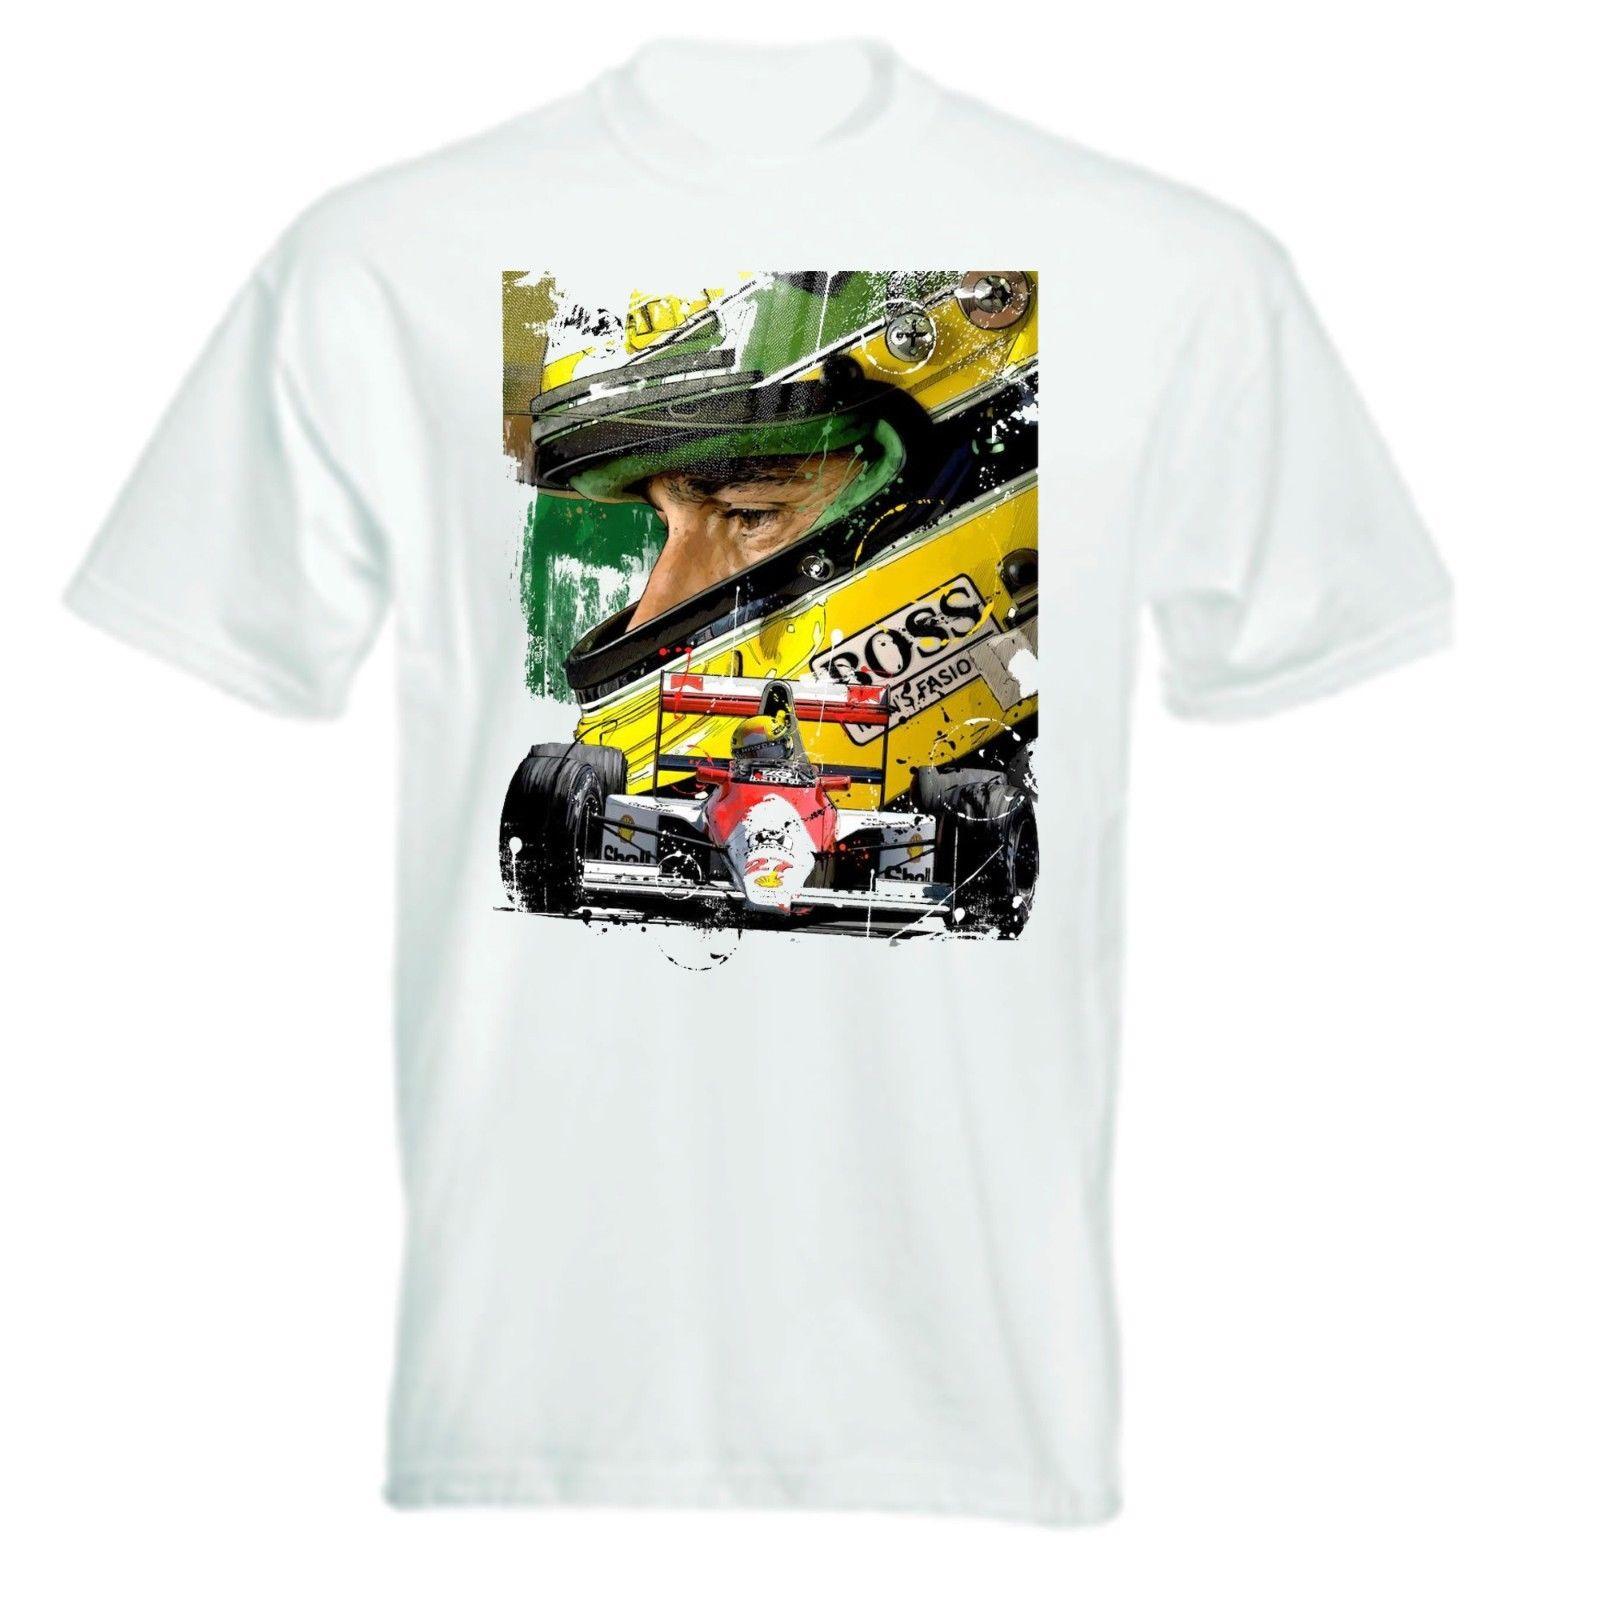 ayrton-font-b-senna-b-font-artwork-t-shirt-top-quality-t-shirts-men-o-neck-short-sleeve-cotton-t-shirts-man-clothing-letter-printing